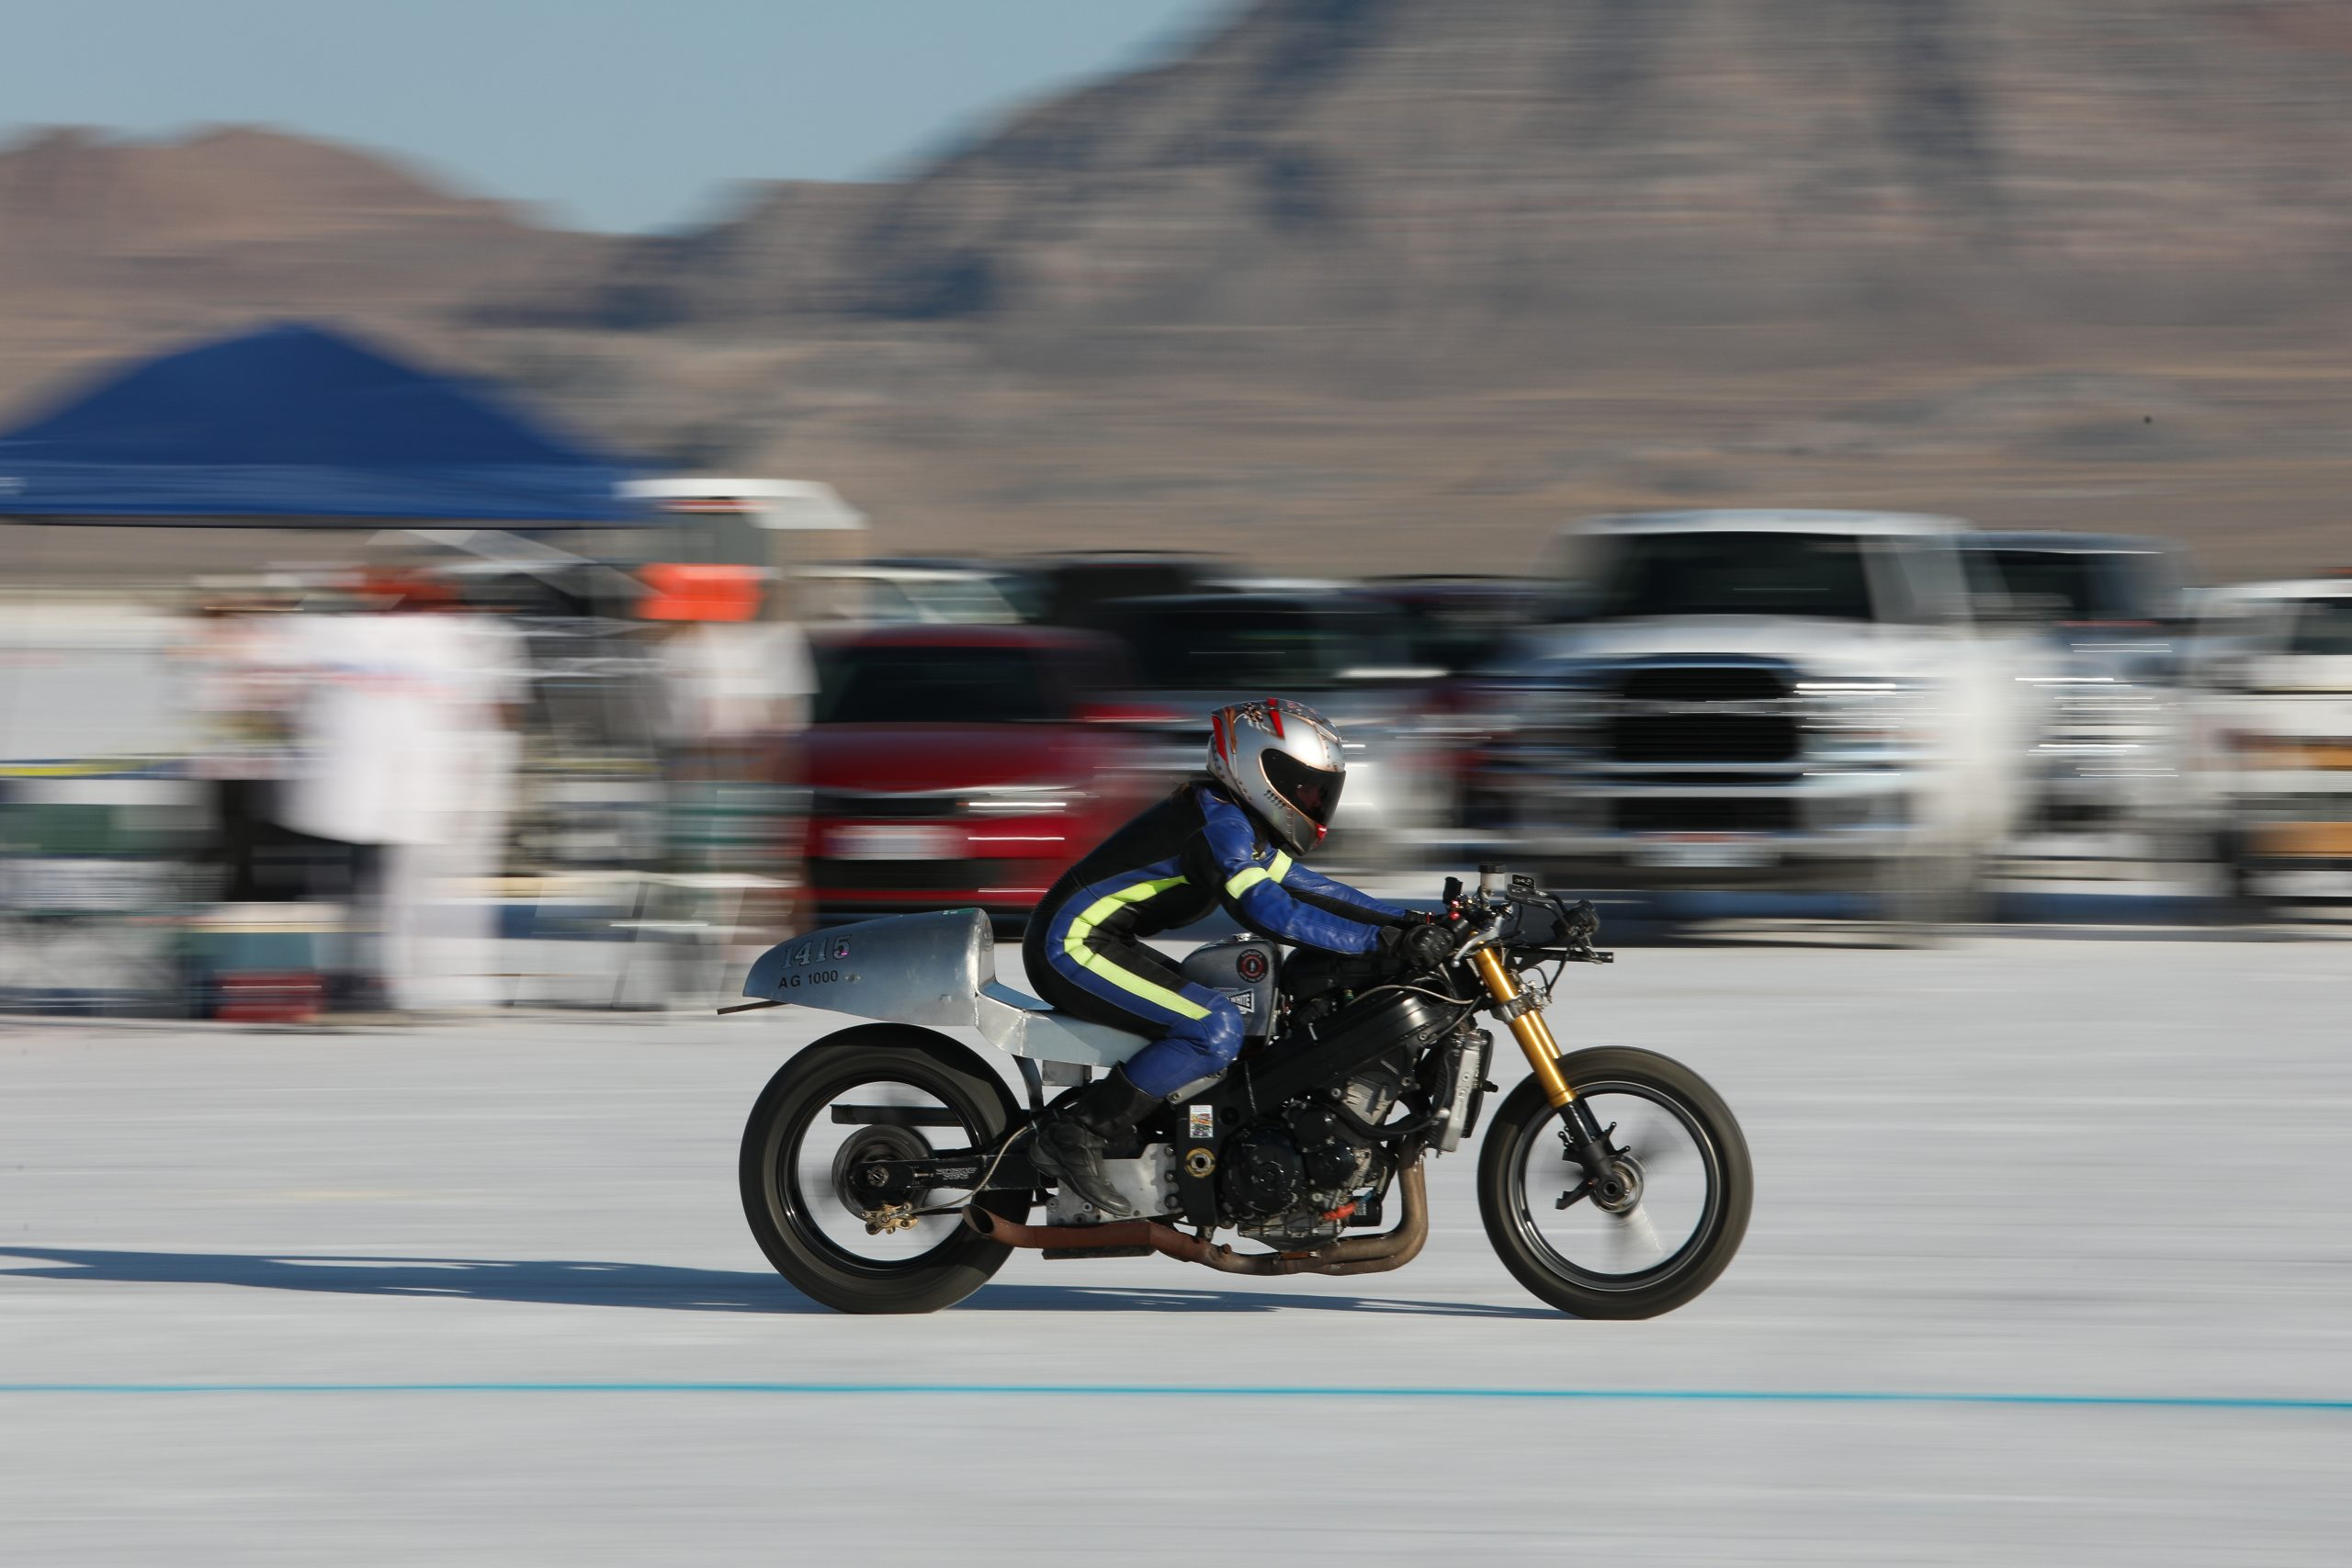 Bonneville Motorcycle starting line 2020